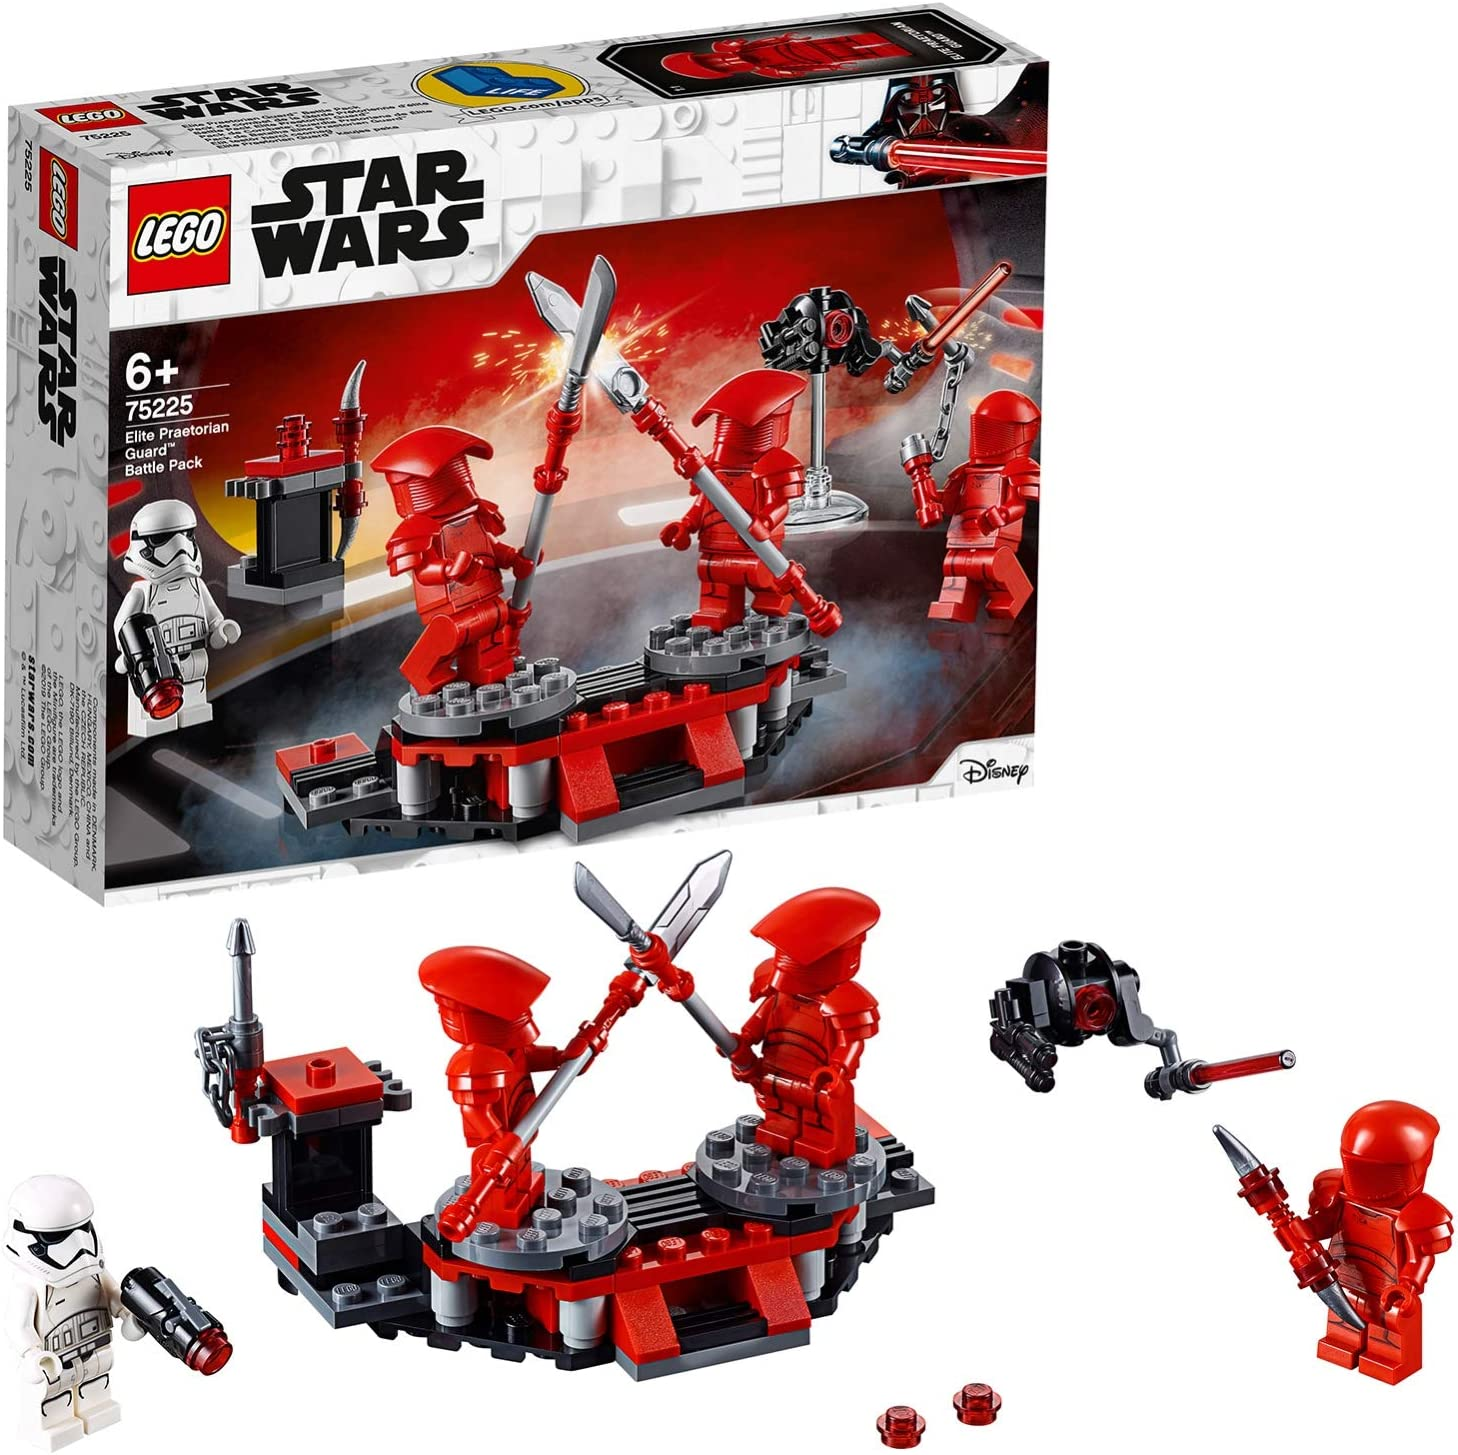 Lego ® Star Wars set 75225 elite Praetorian Guard nuevo 75226 Inferno Squad